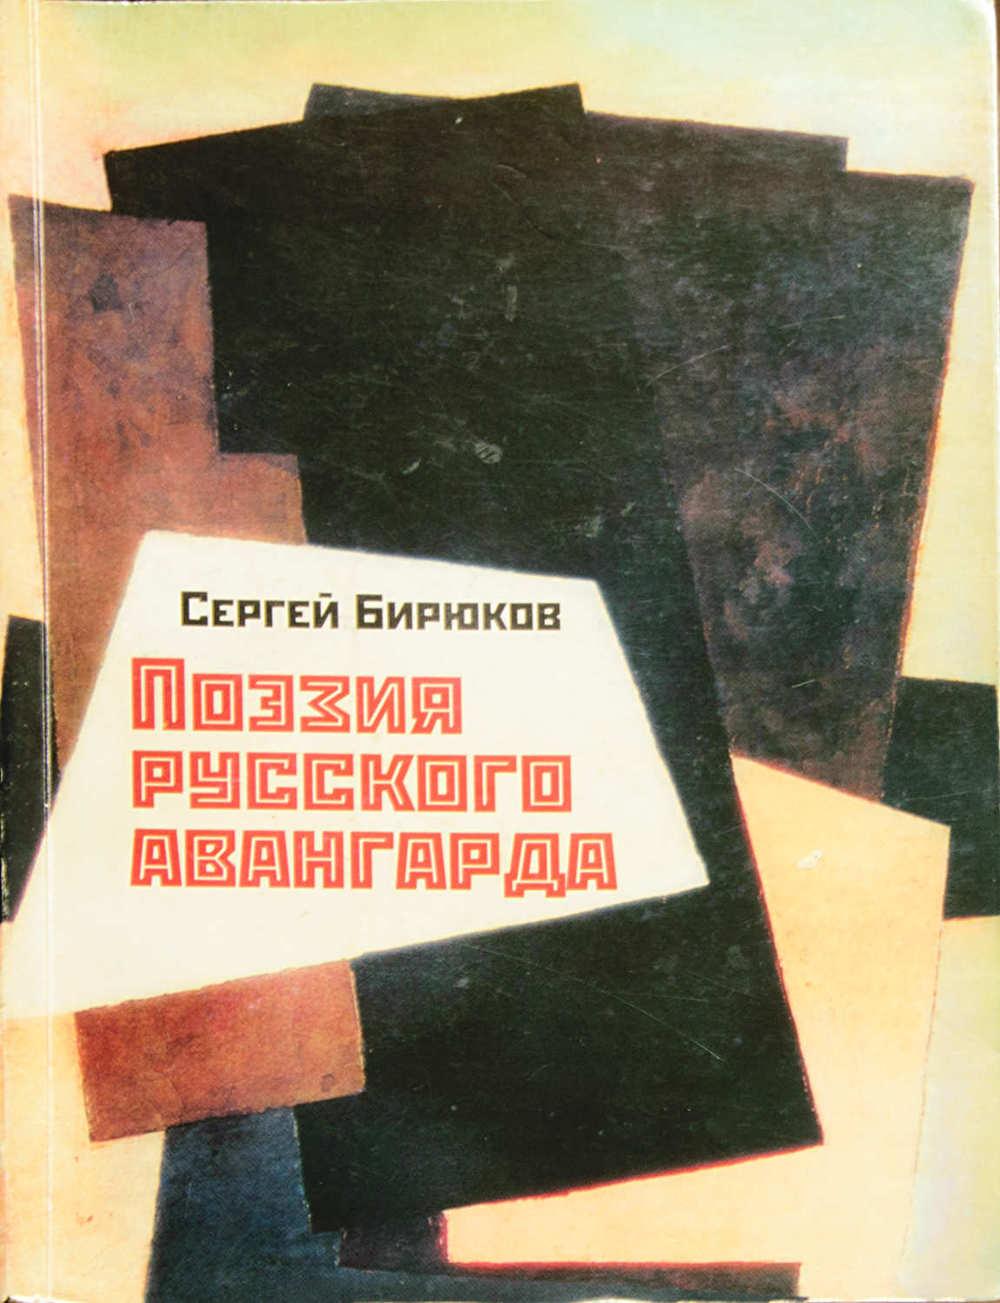 Поэзия русского авангарда  : Сергей Бирюков